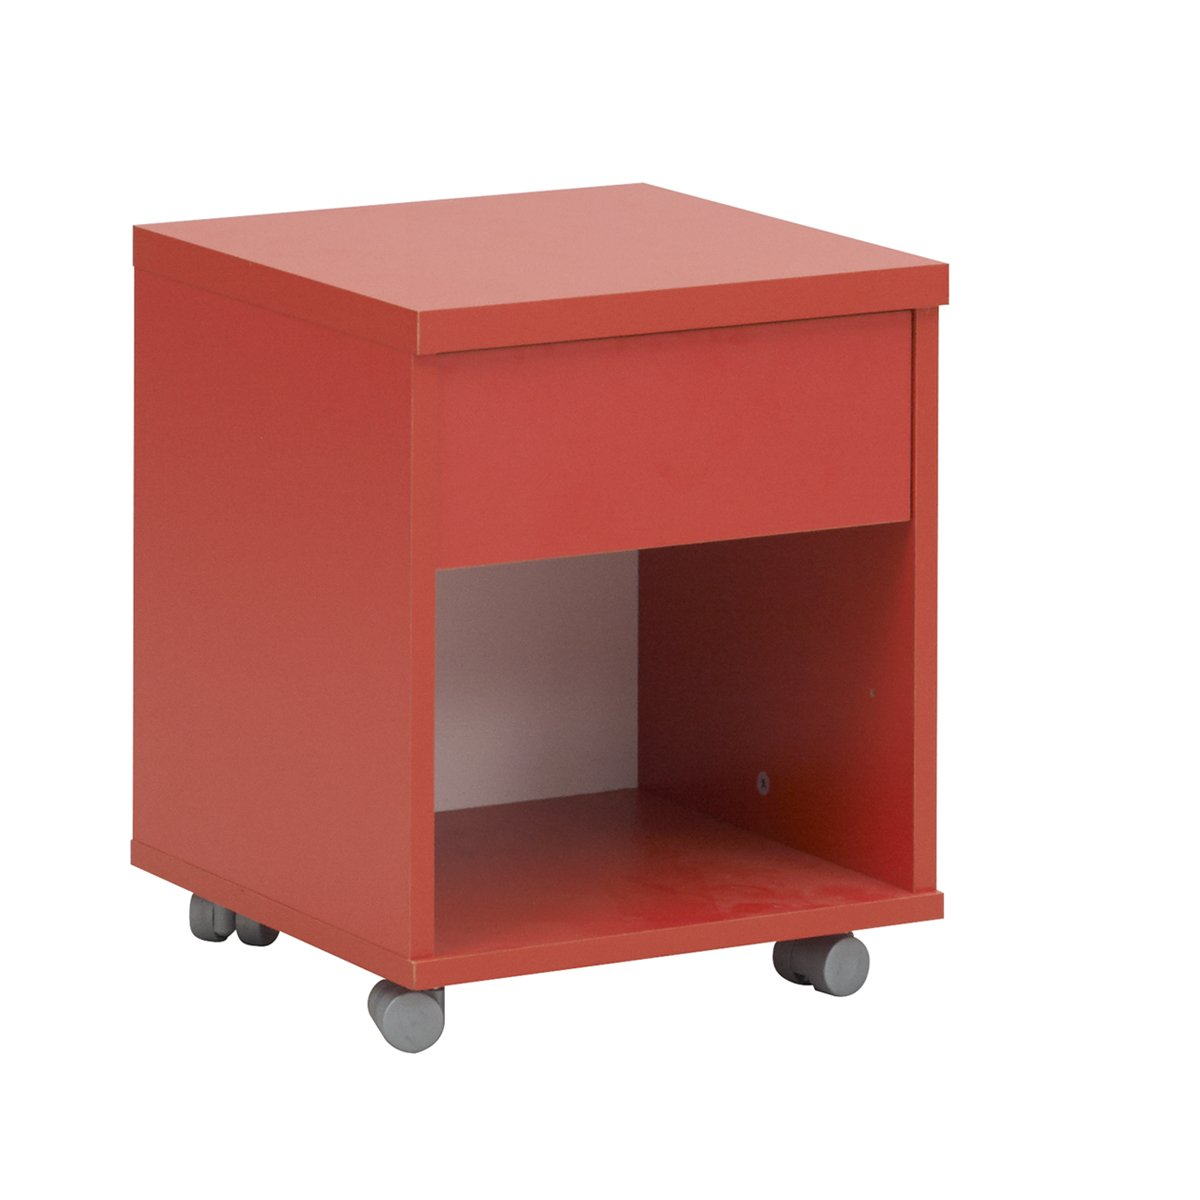 Gami Mobile Einheit, Holz, Weiß/Rot, 36 x 36 x 44 cm